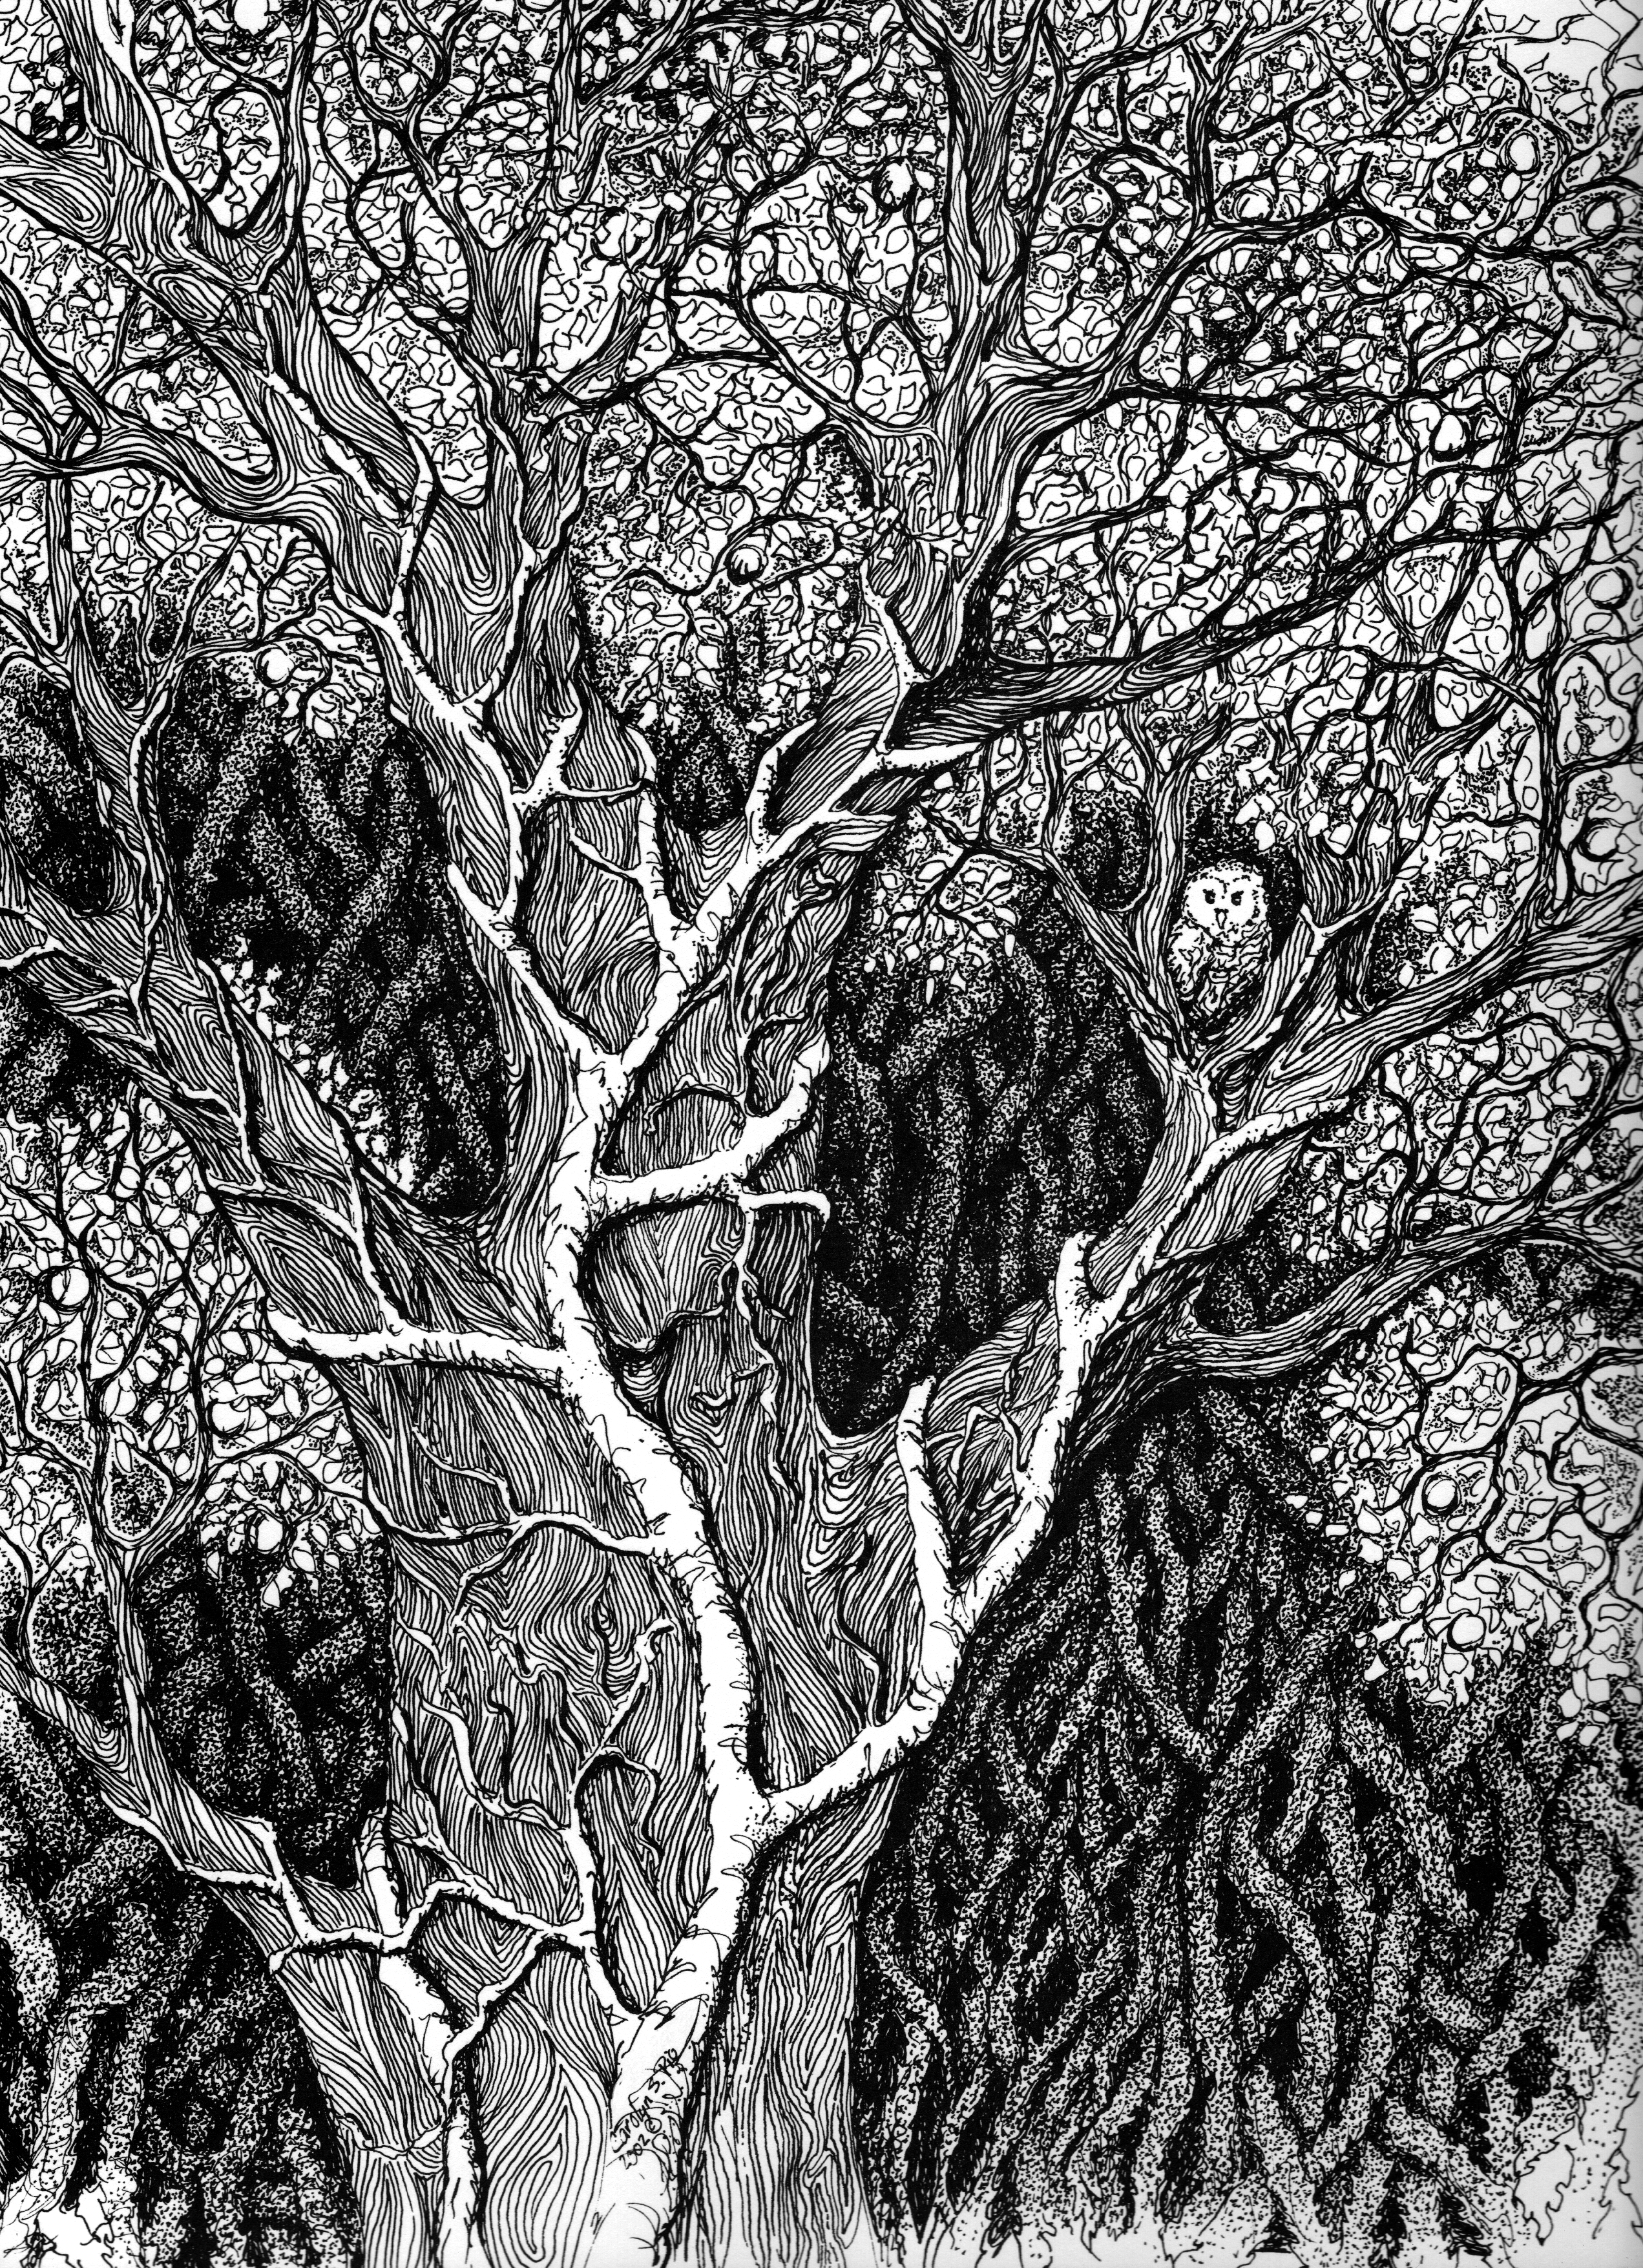 Tree wOwl